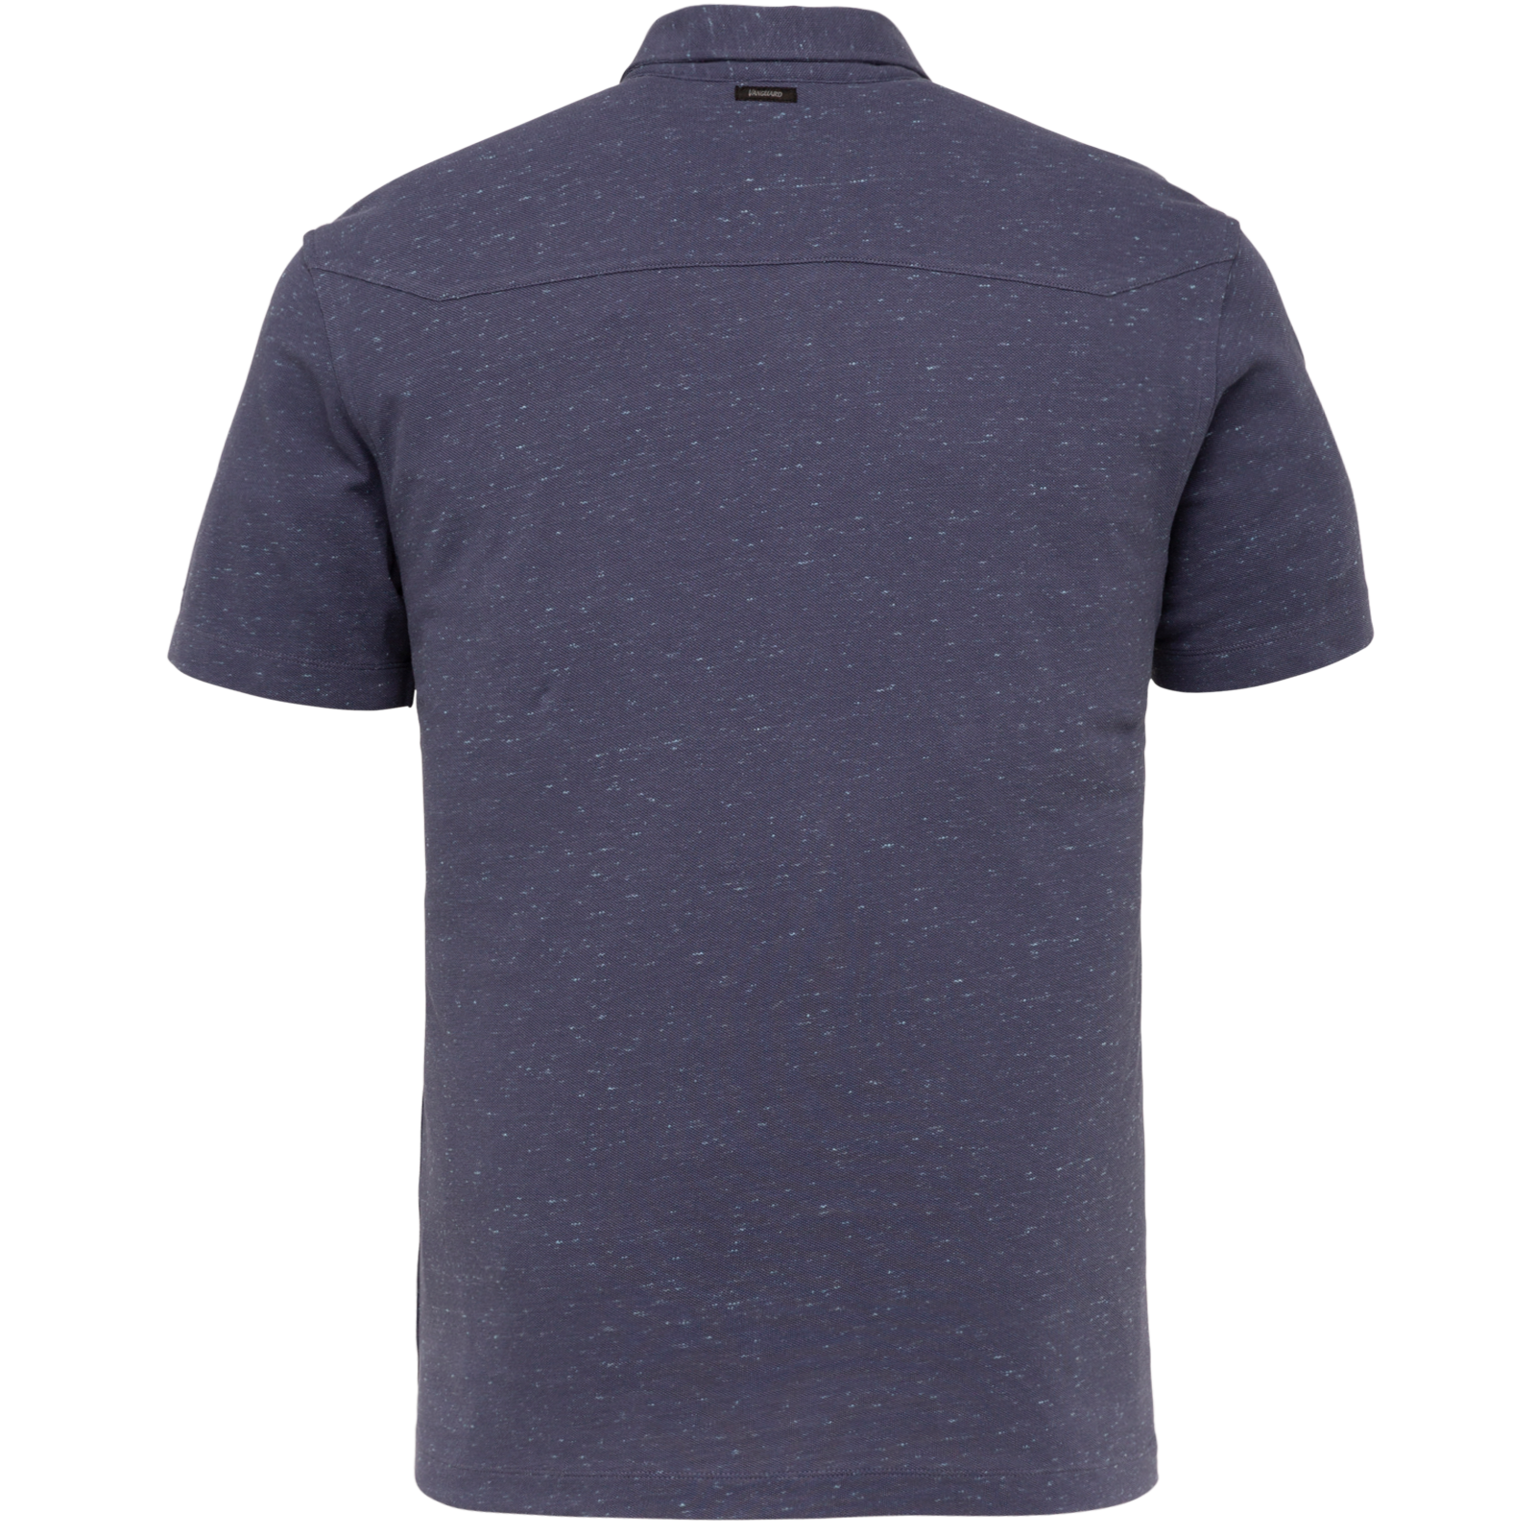 VANGUARD chemise manches courtes-2